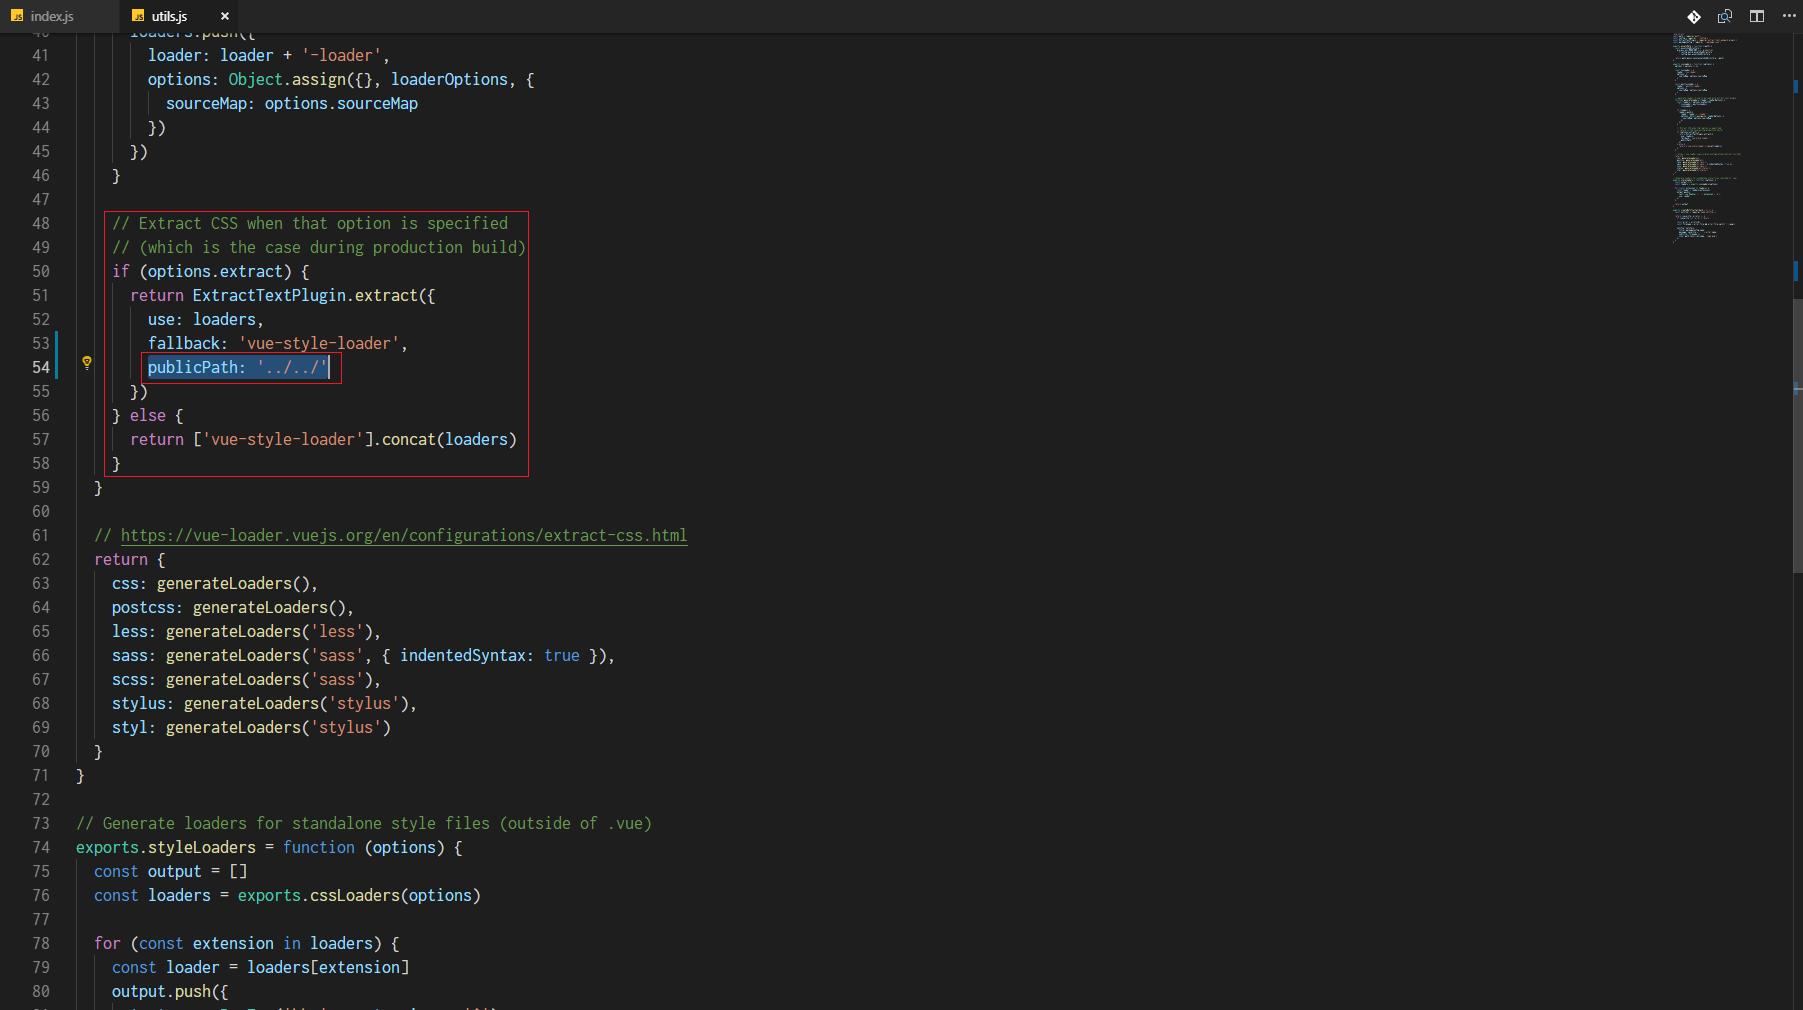 /build/utils.js